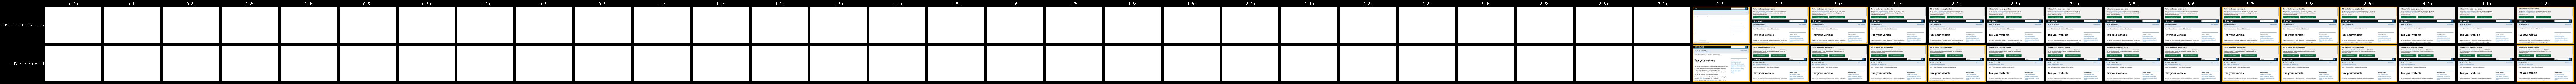 start-3g